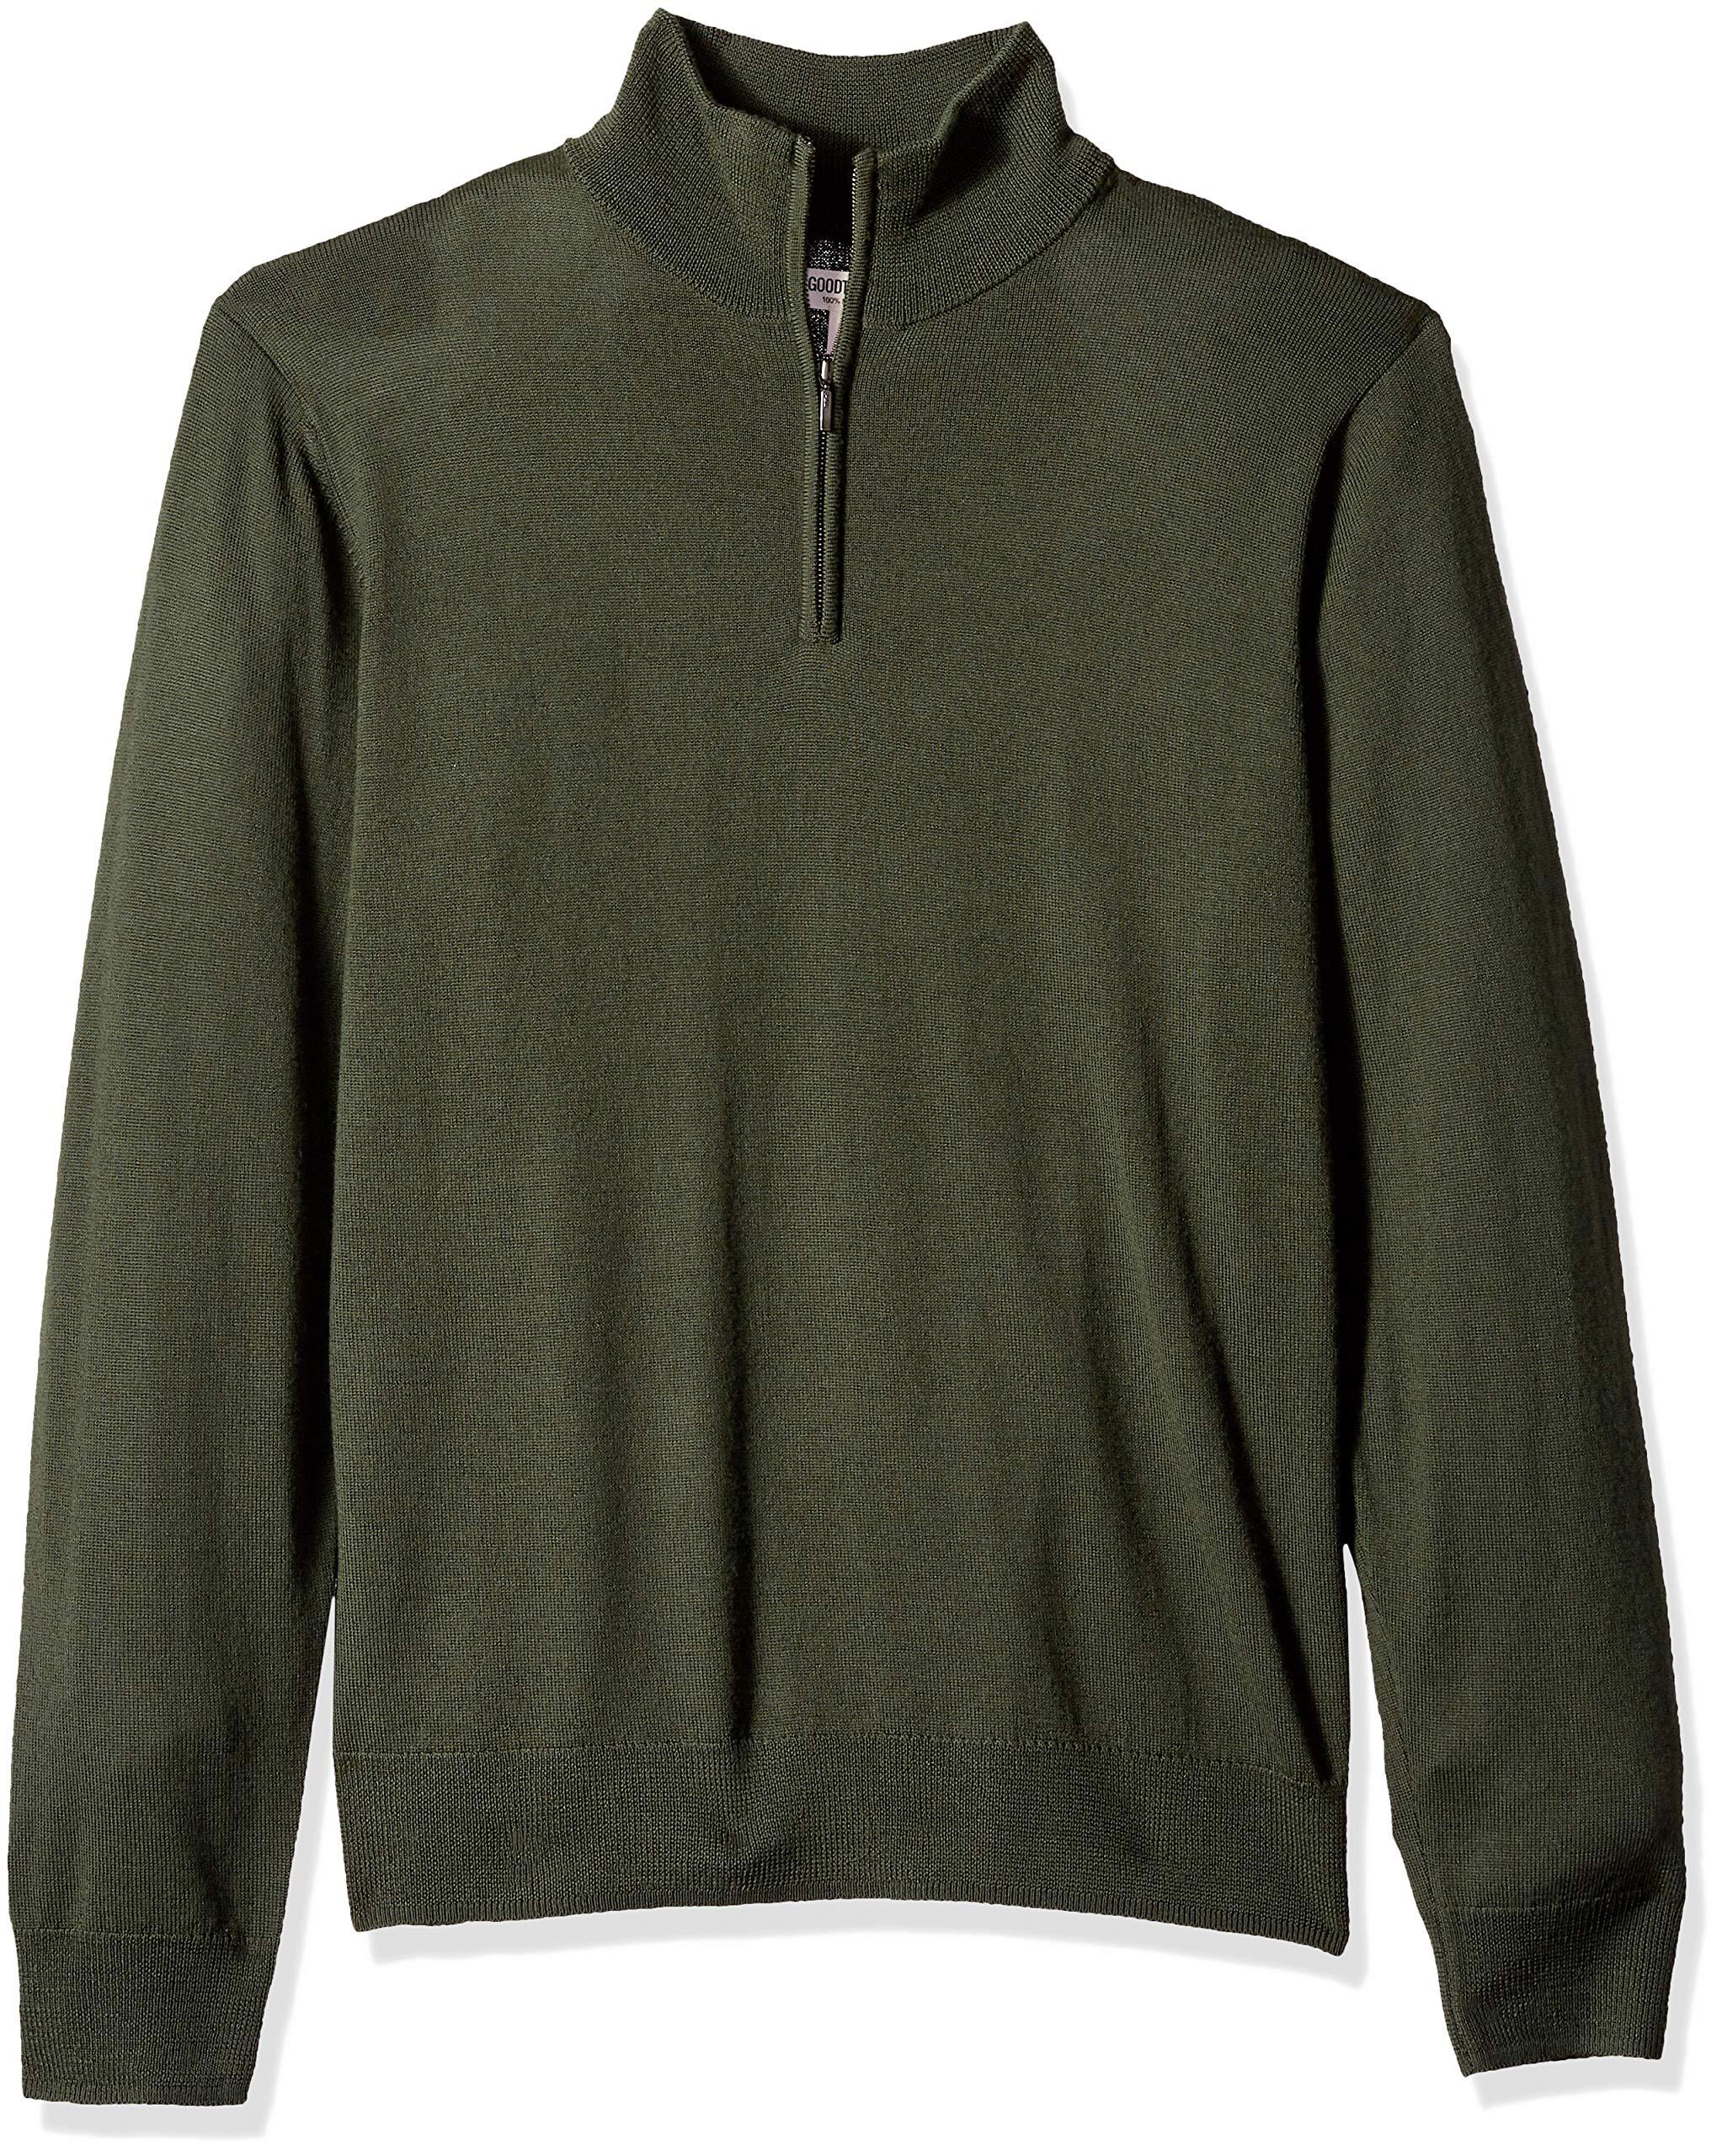 Goodthreads Men's Merino Wool Quarter Zip Sweater, Olive, XX-Large